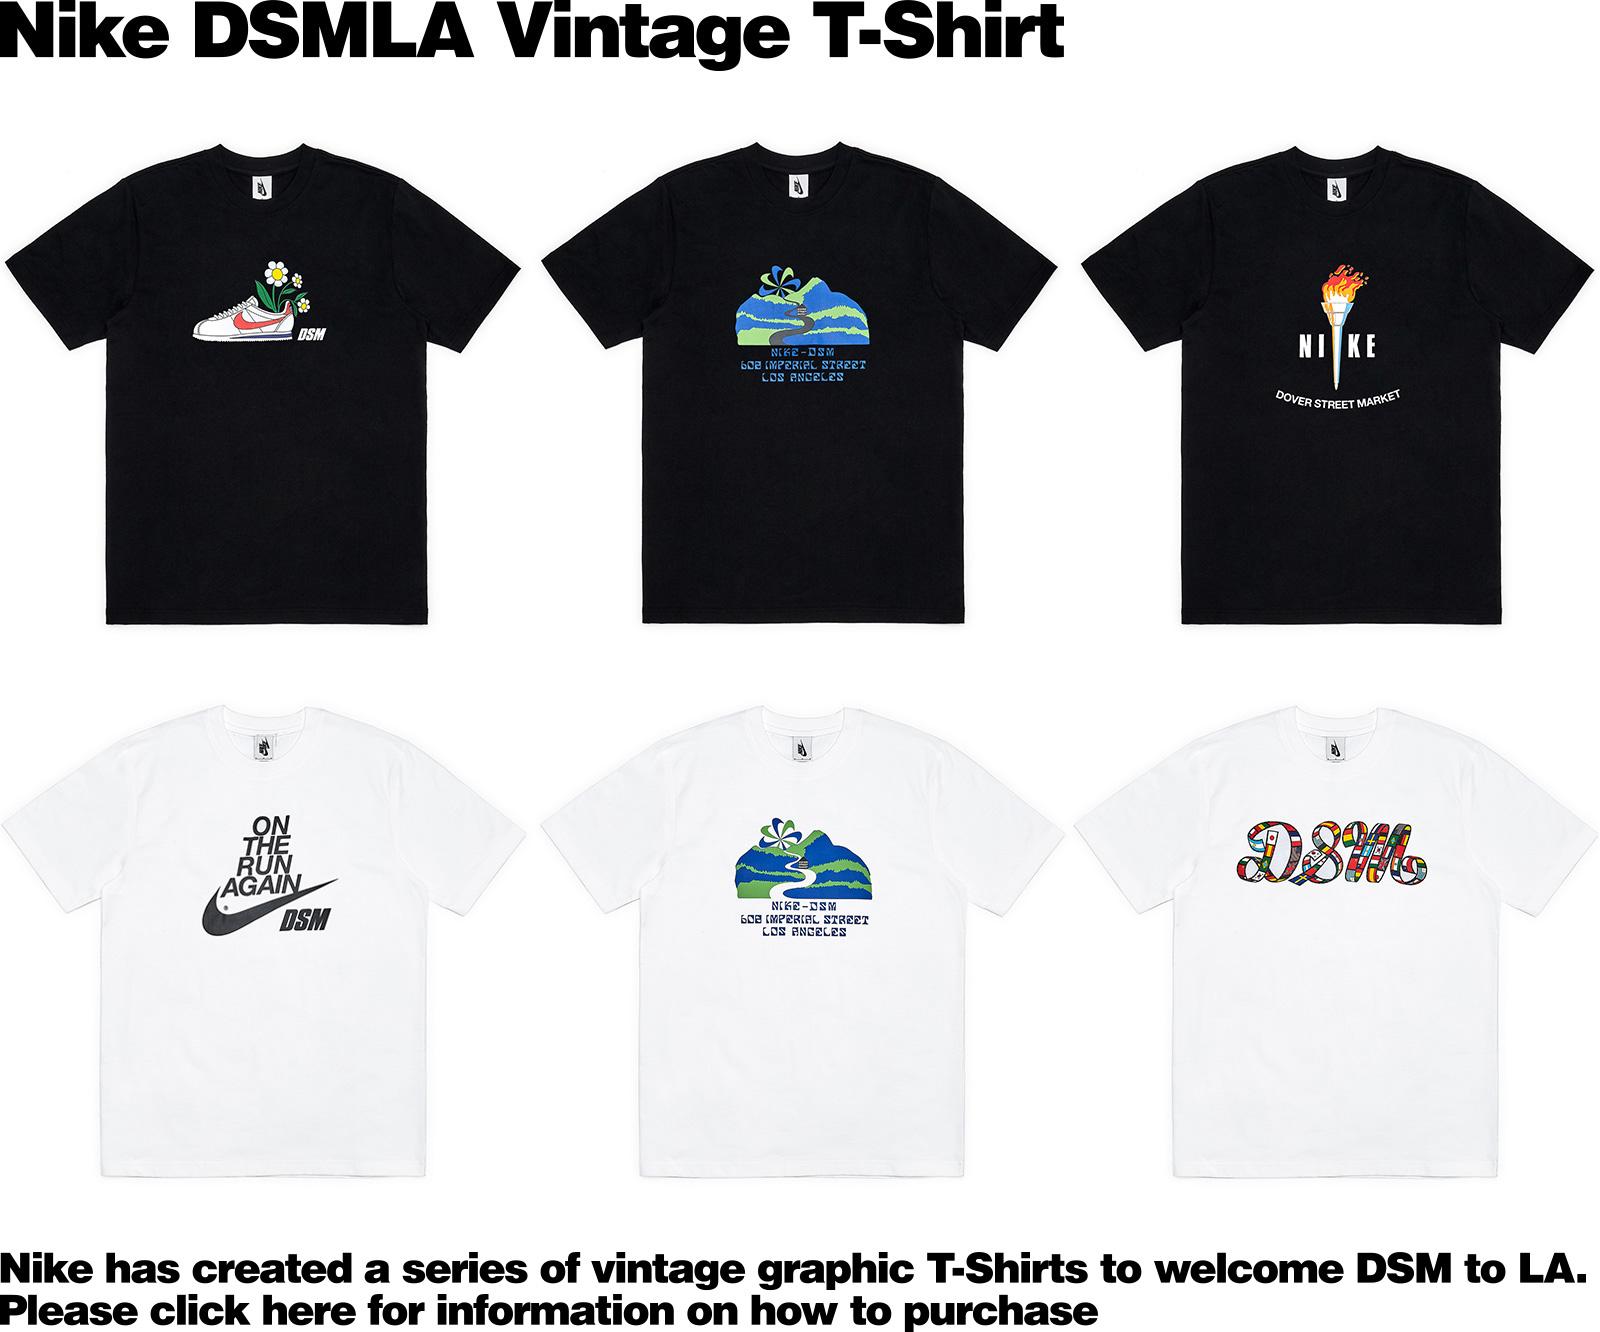 dsmla_nike-t-shirt.jpg